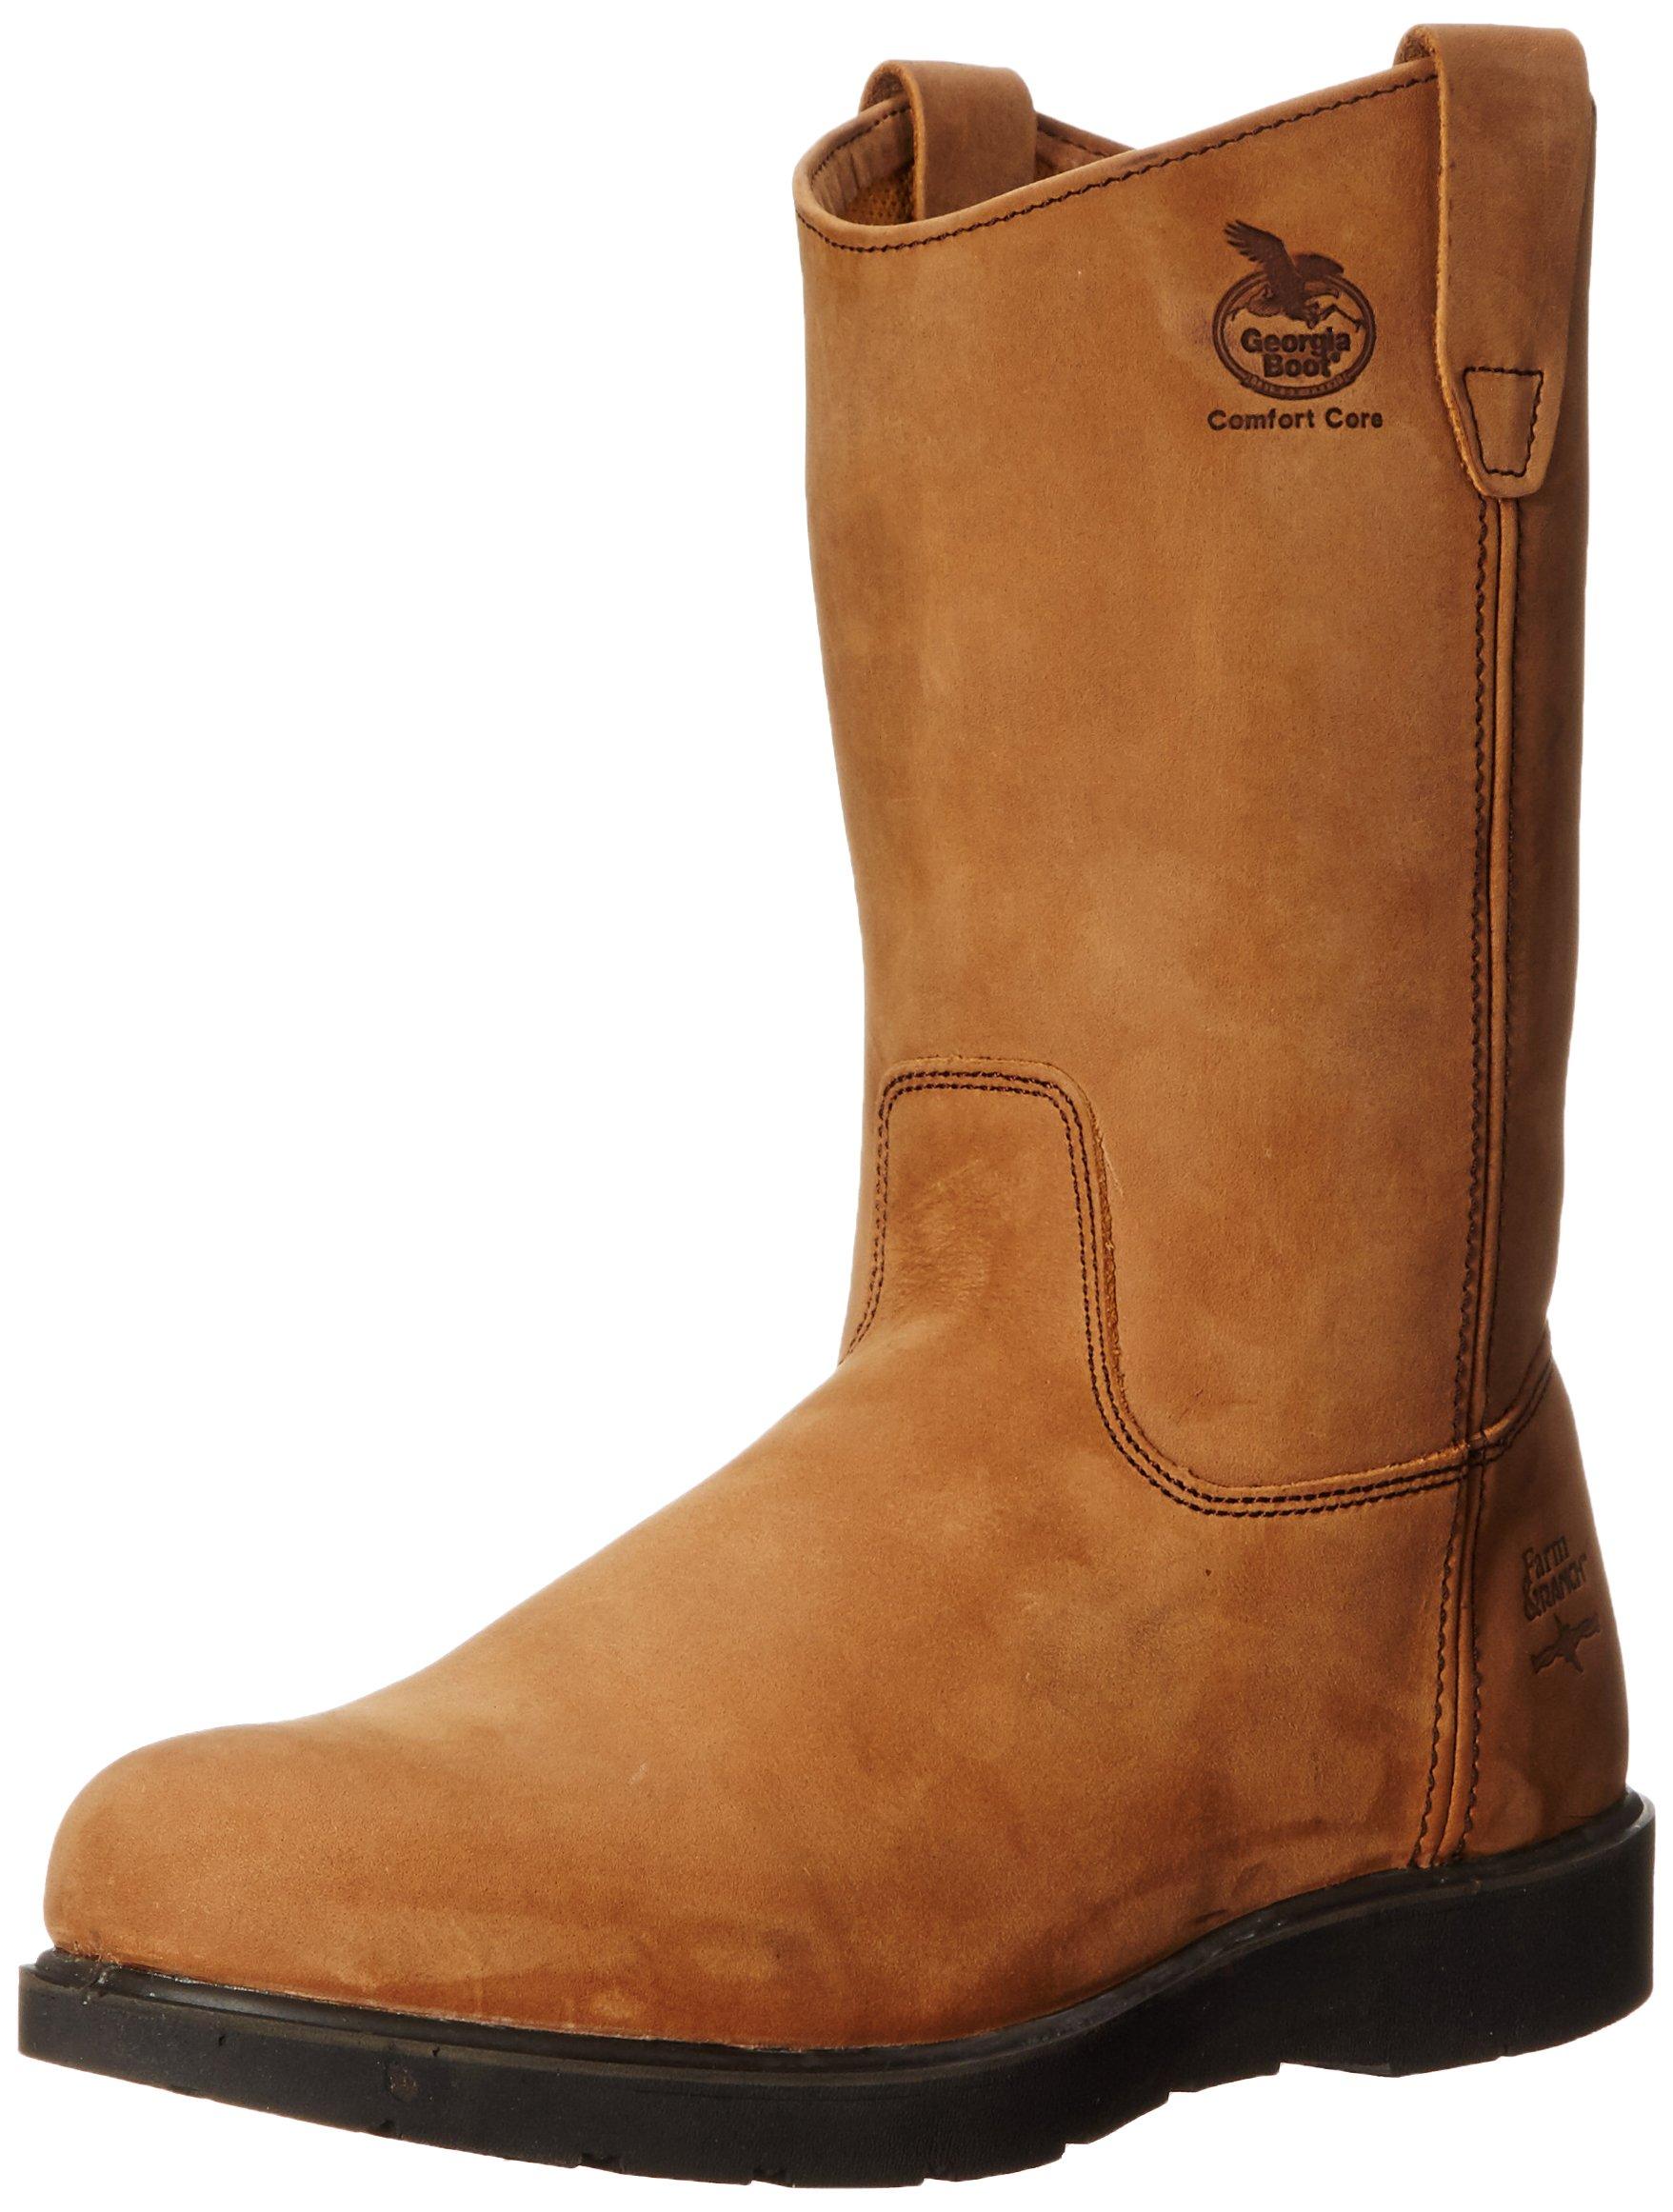 Georgia Boot Men's Wellington Brown Leather Work 12 D(M) US